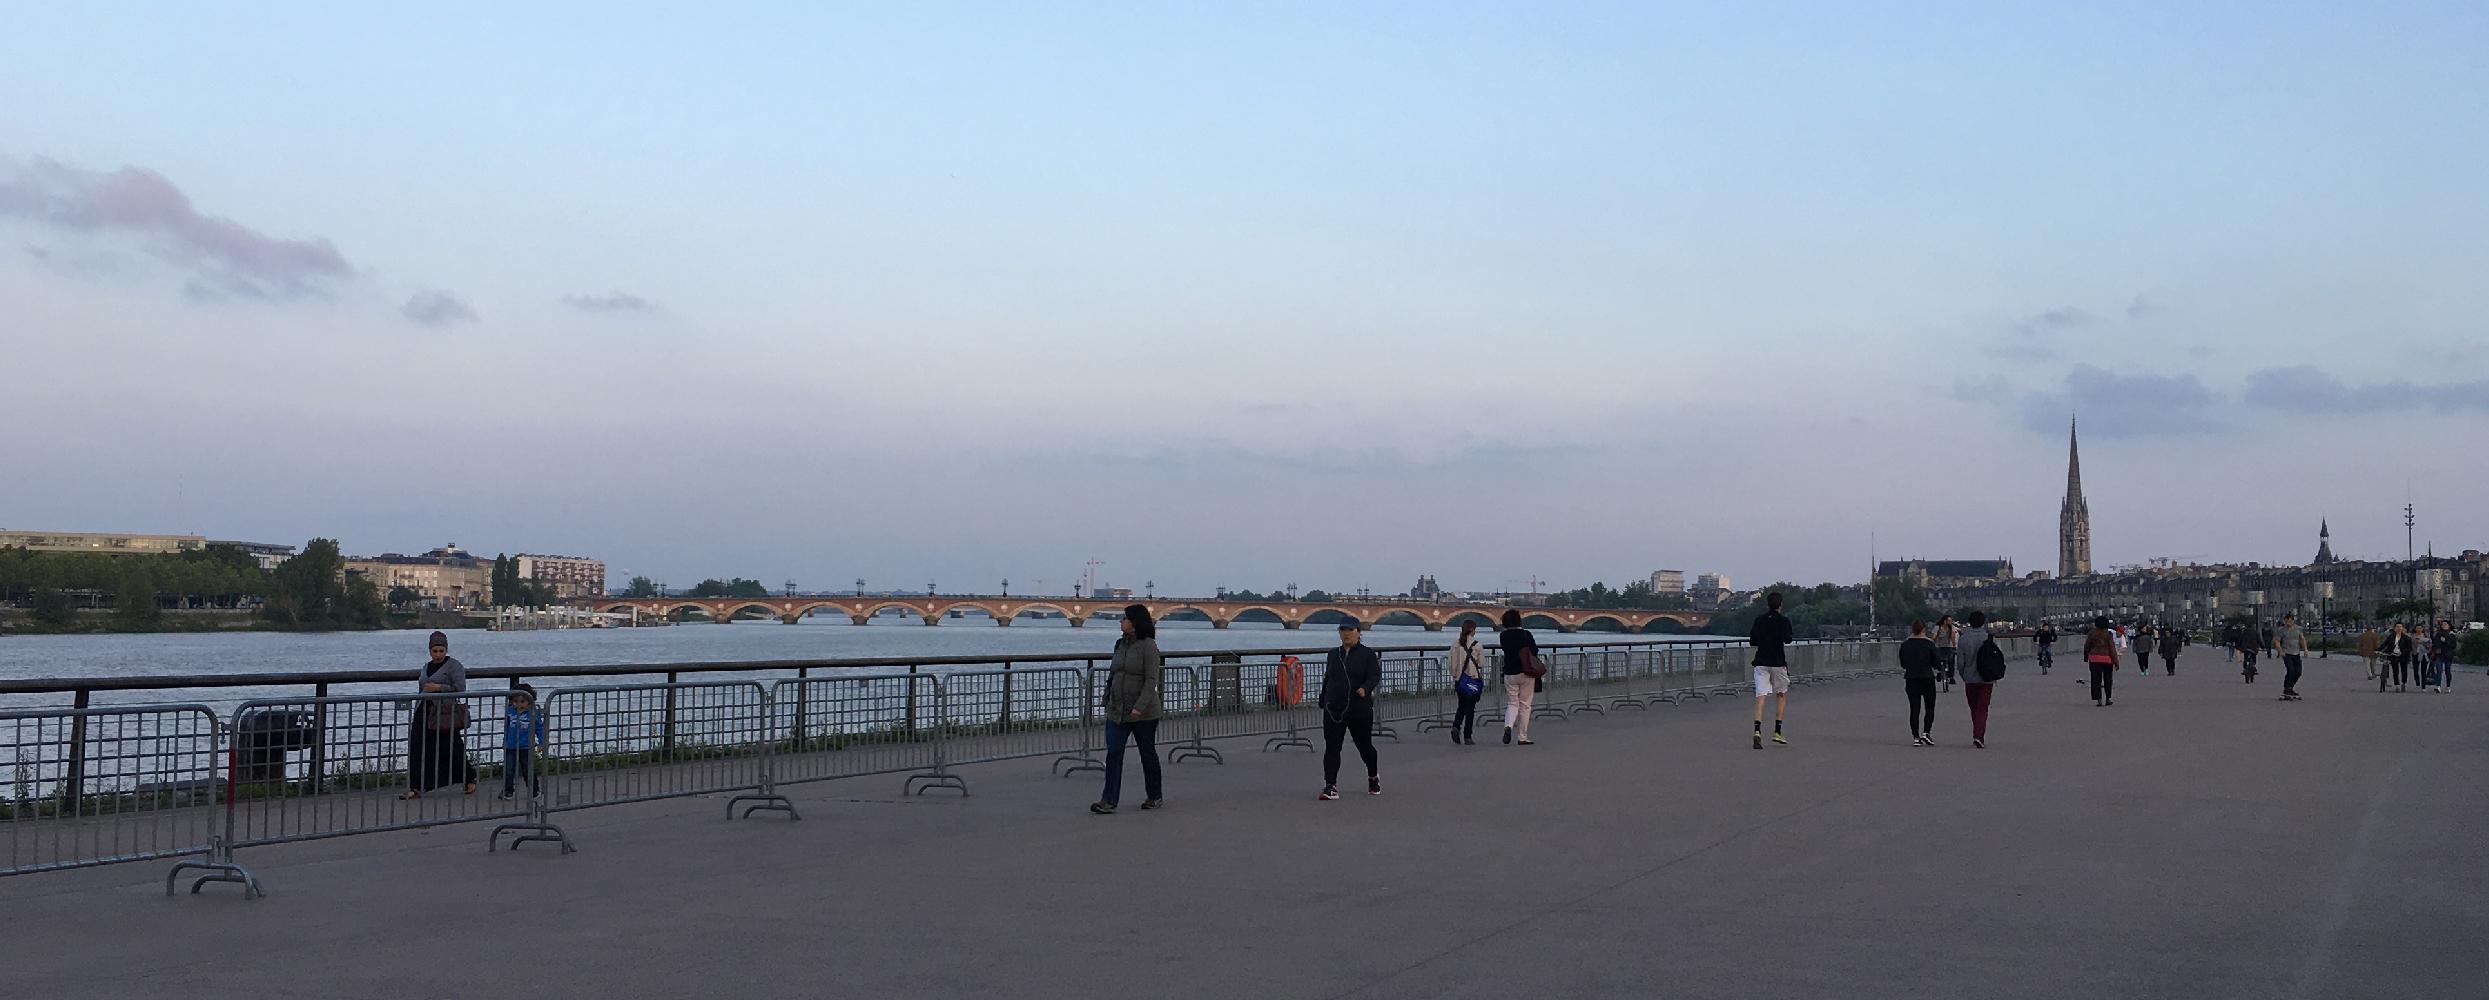 Lungofiume di Bordeaux